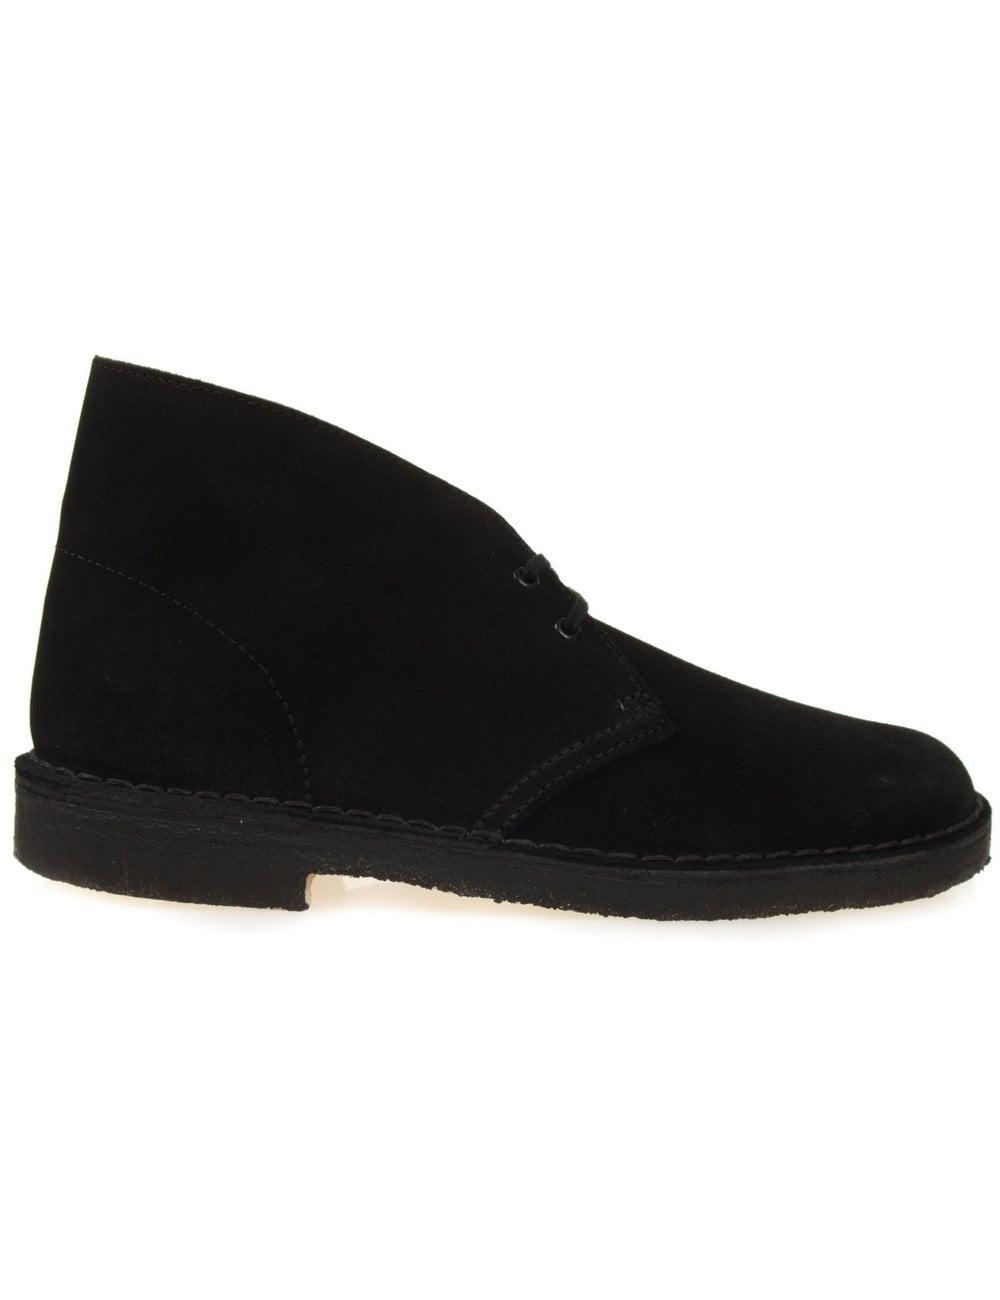 eb0f0b3b8 Clarks Originals Desert Boot - Black Suede - Footwear from Fat ...